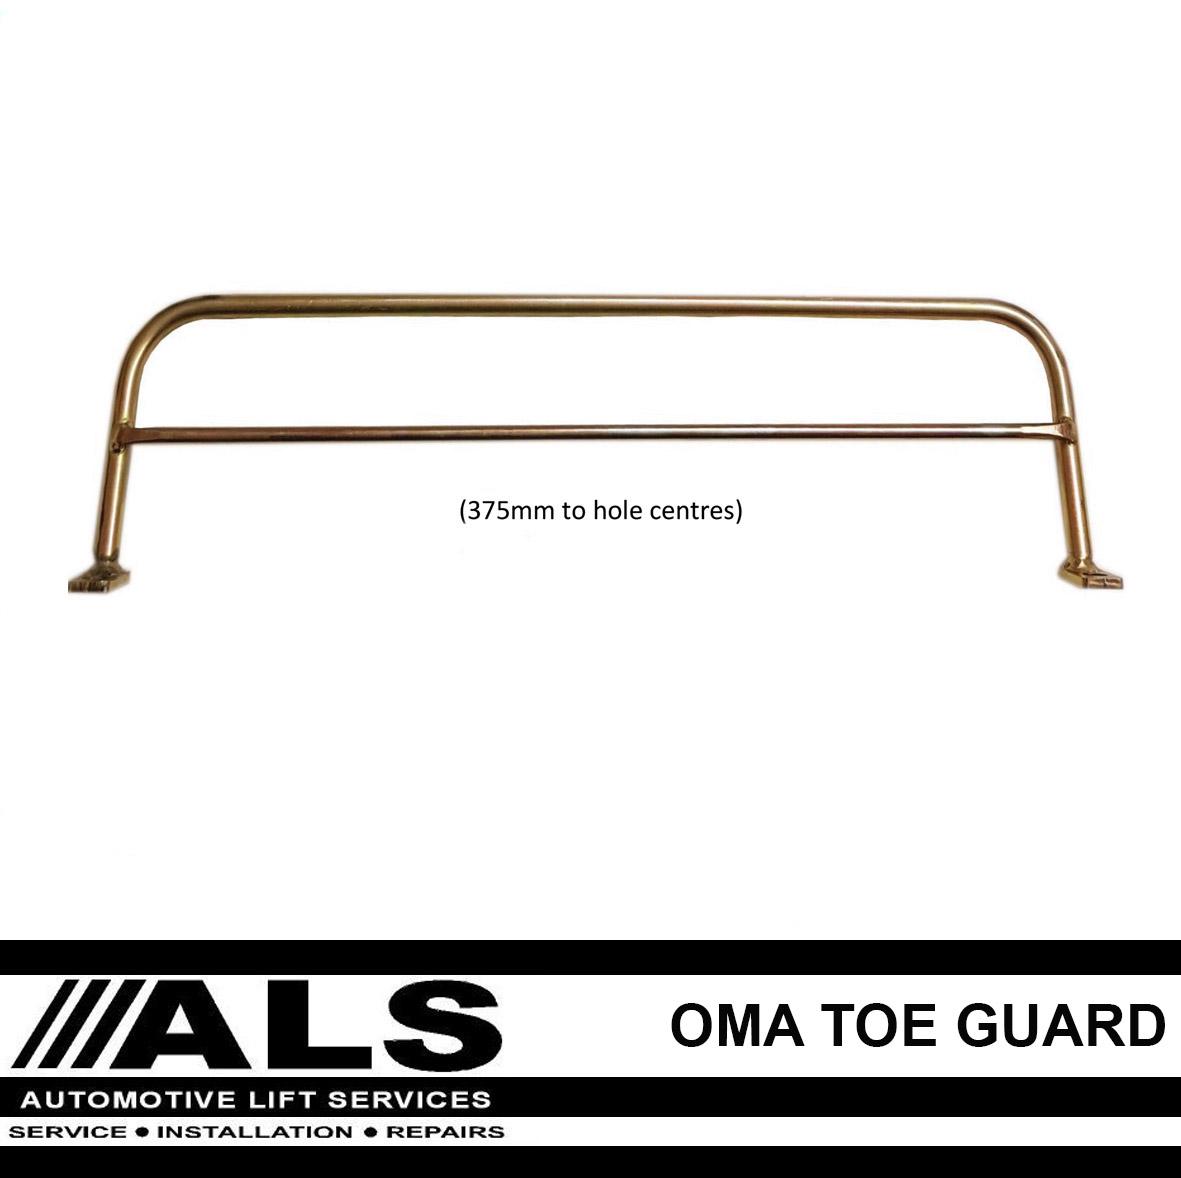 https://www.automotiveliftservices.co.uk/wp-content/uploads/2018/10/OMA-TOE-GUARD-B0708.jpg